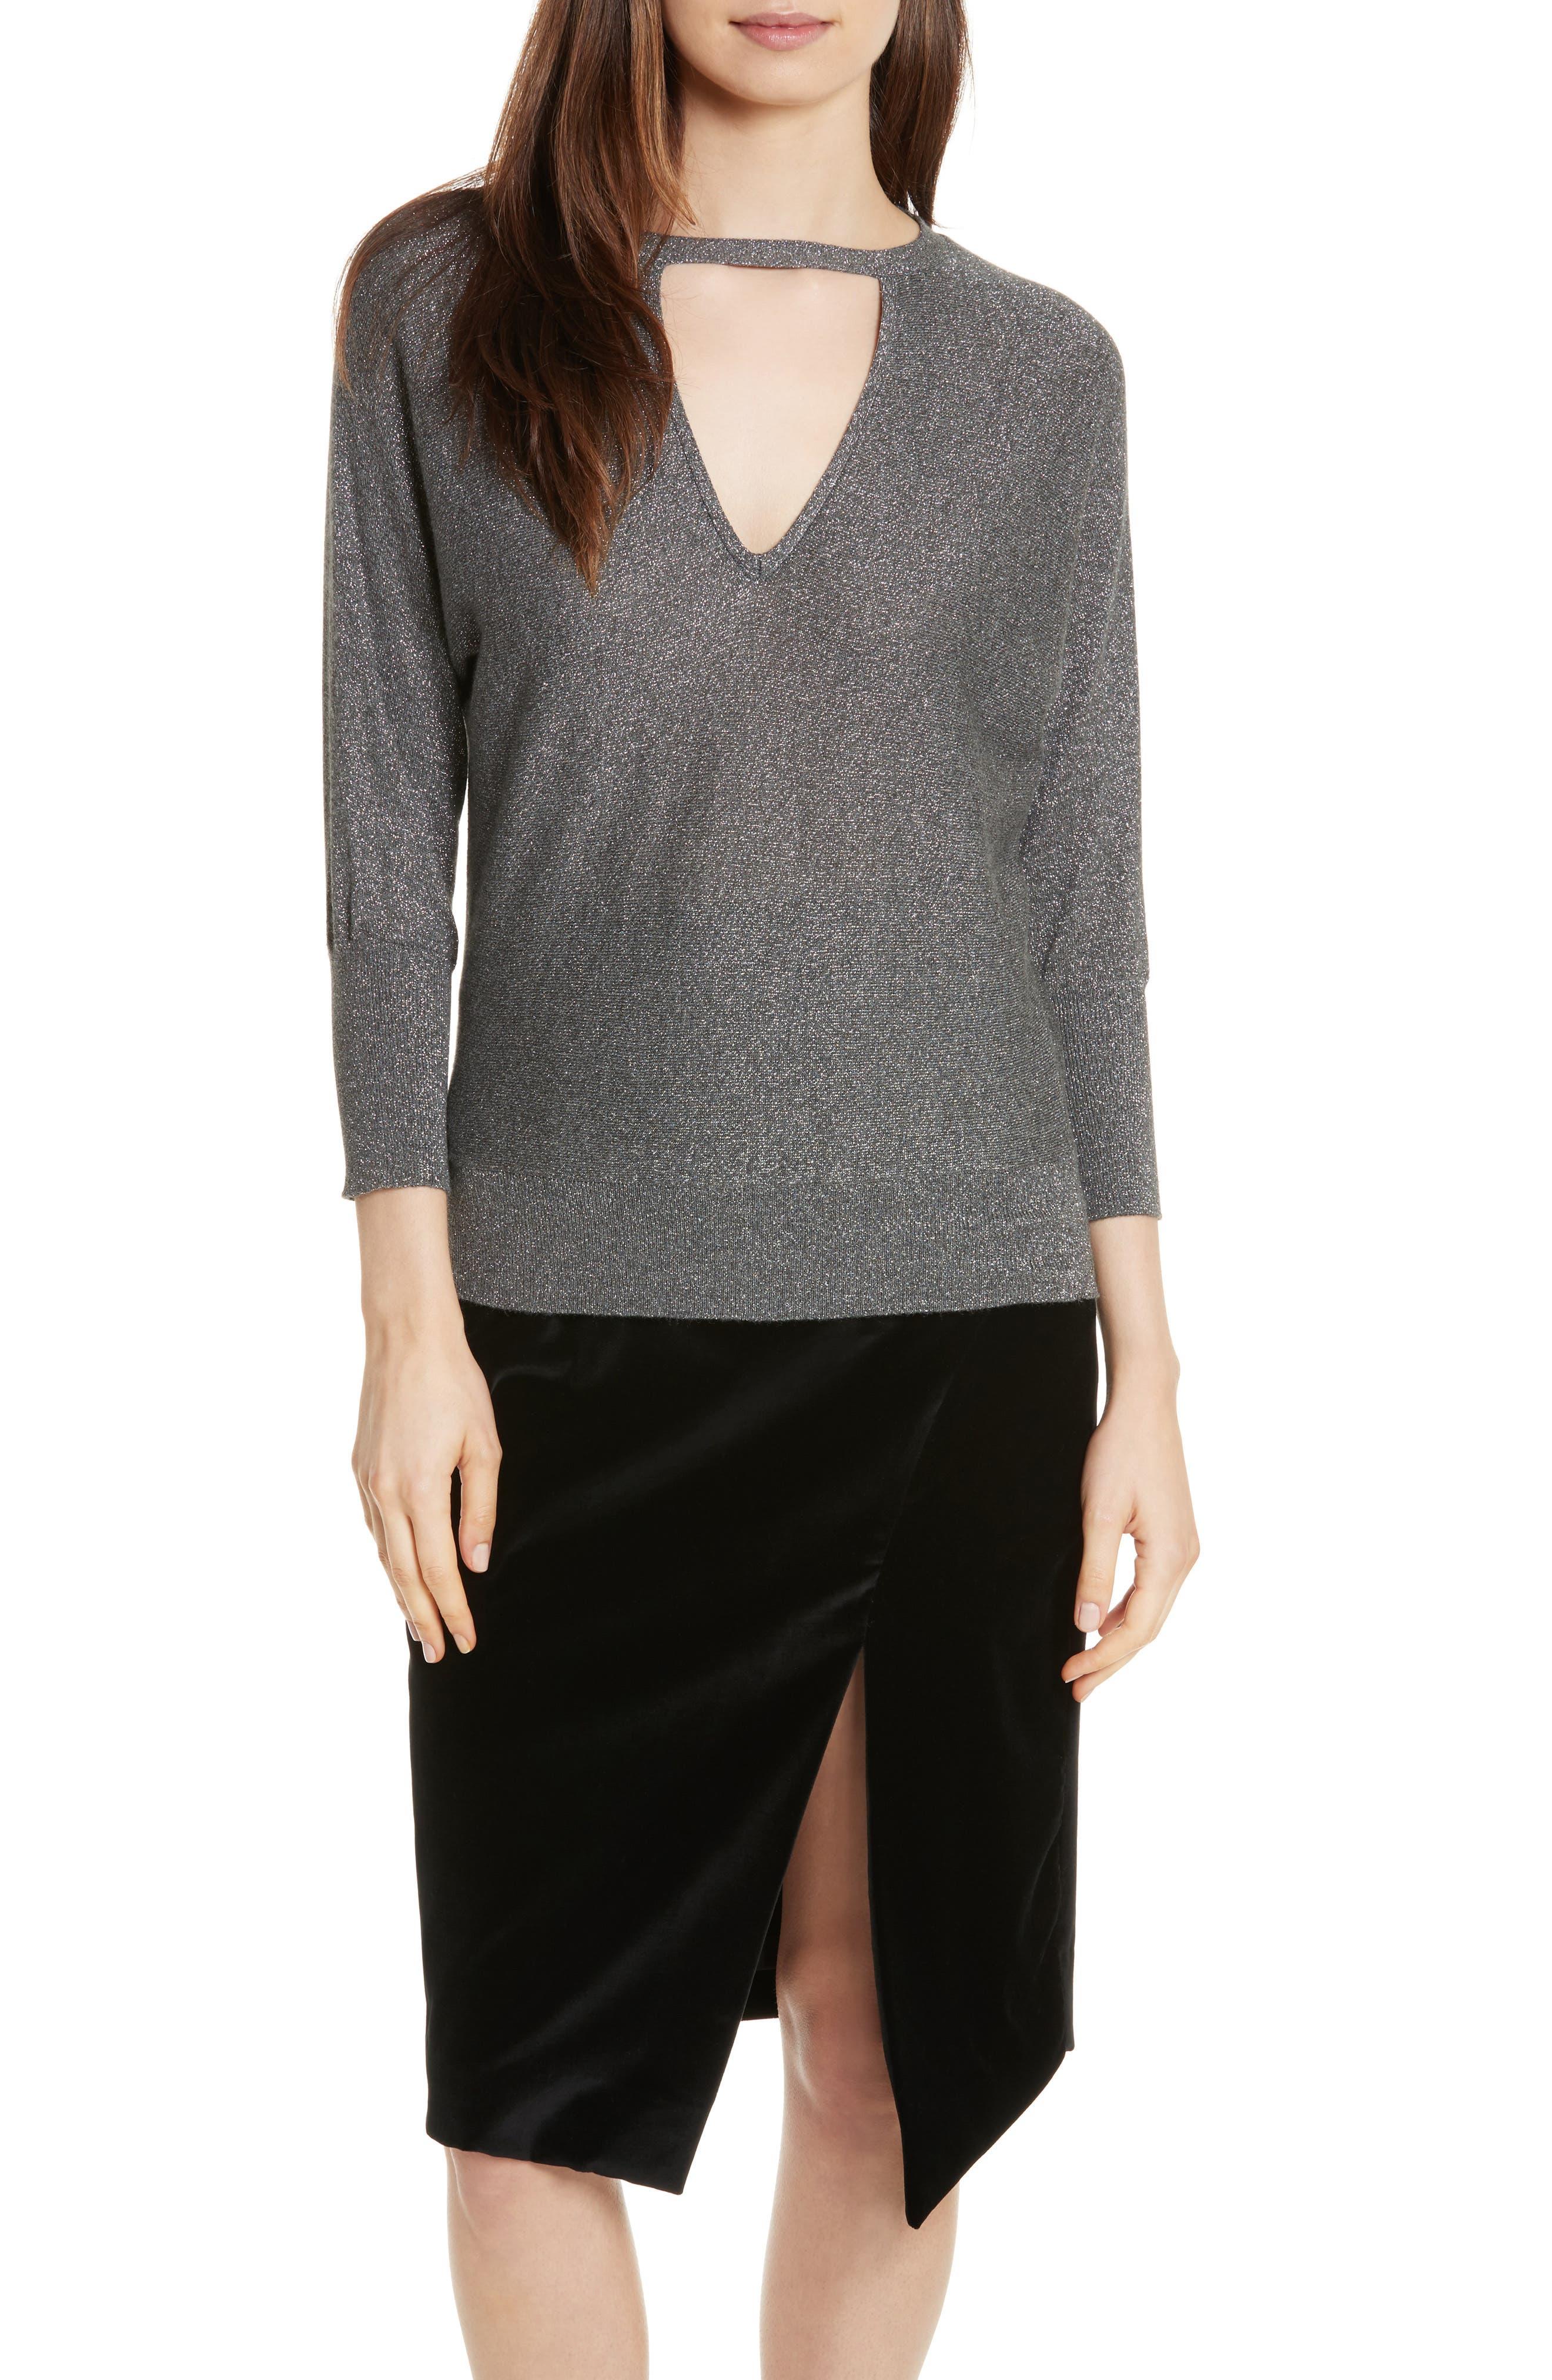 Alternate Image 1 Selected - Milly Metallic Knit Choker Neck Sweater